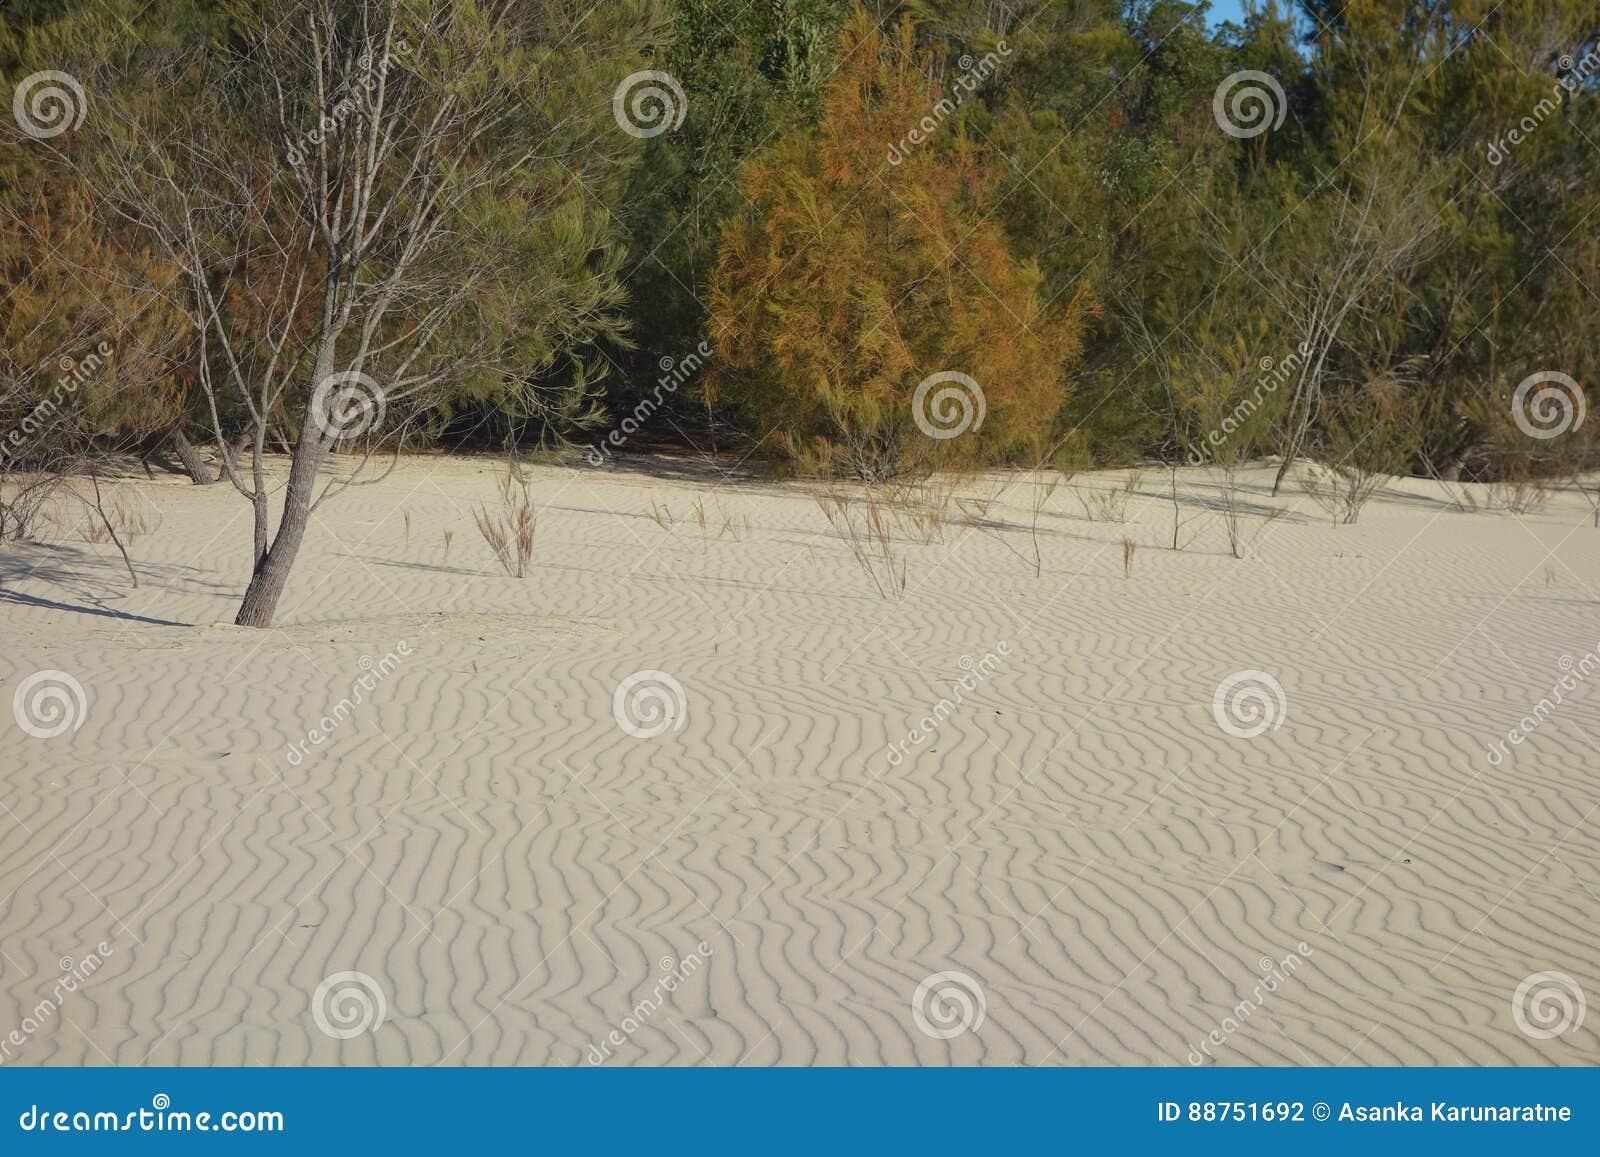 Wzory w piasku